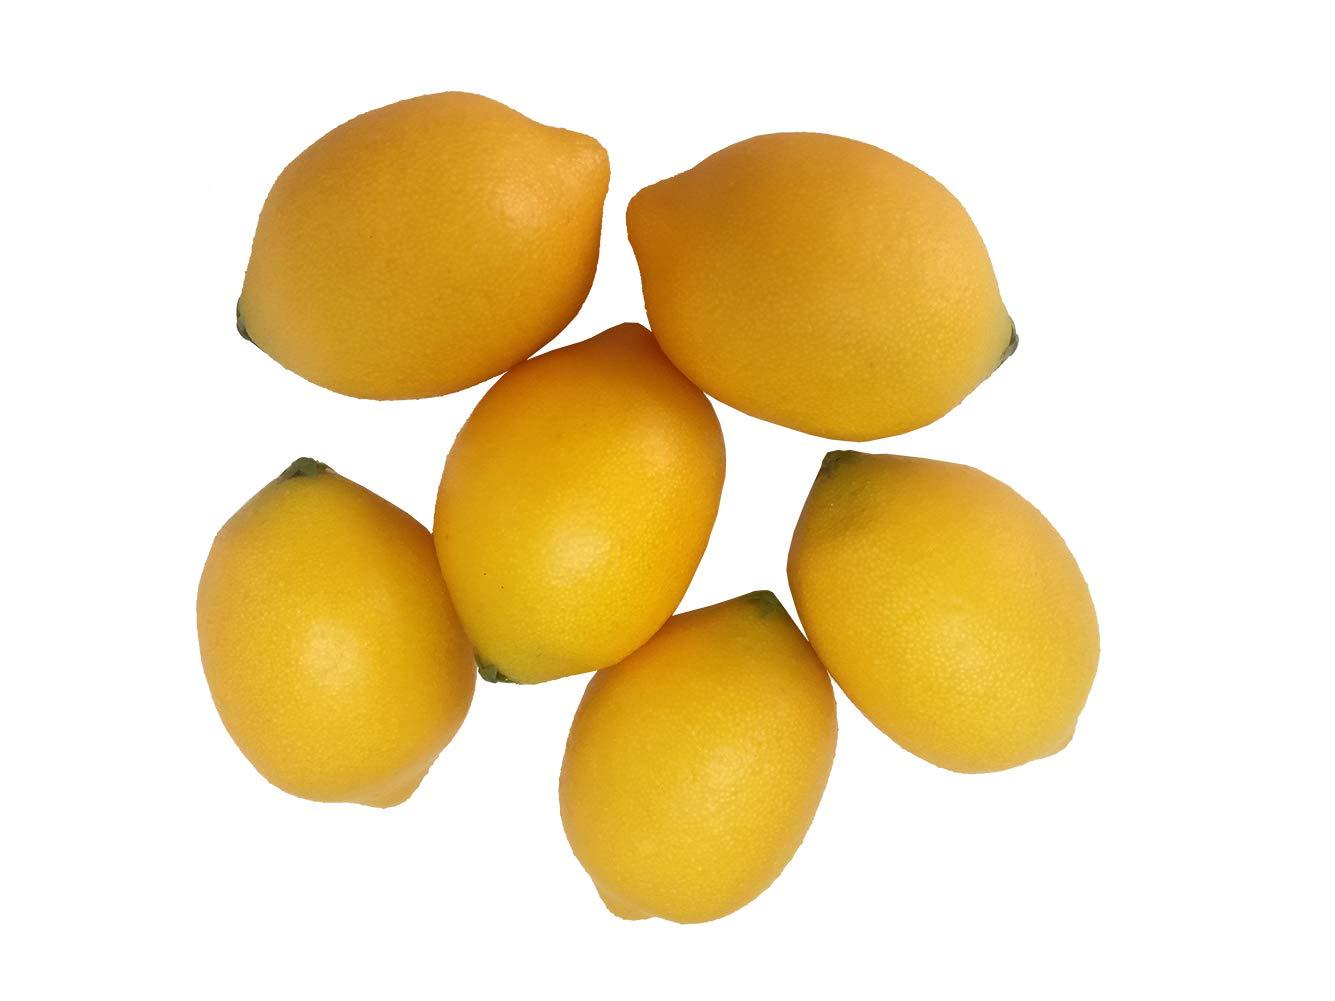 6-PCS-Lifelike-Fake-Fruit-Artificial-Yellow-Lemons-Tabletop-Kitchen-Party-Photograph-Decoration